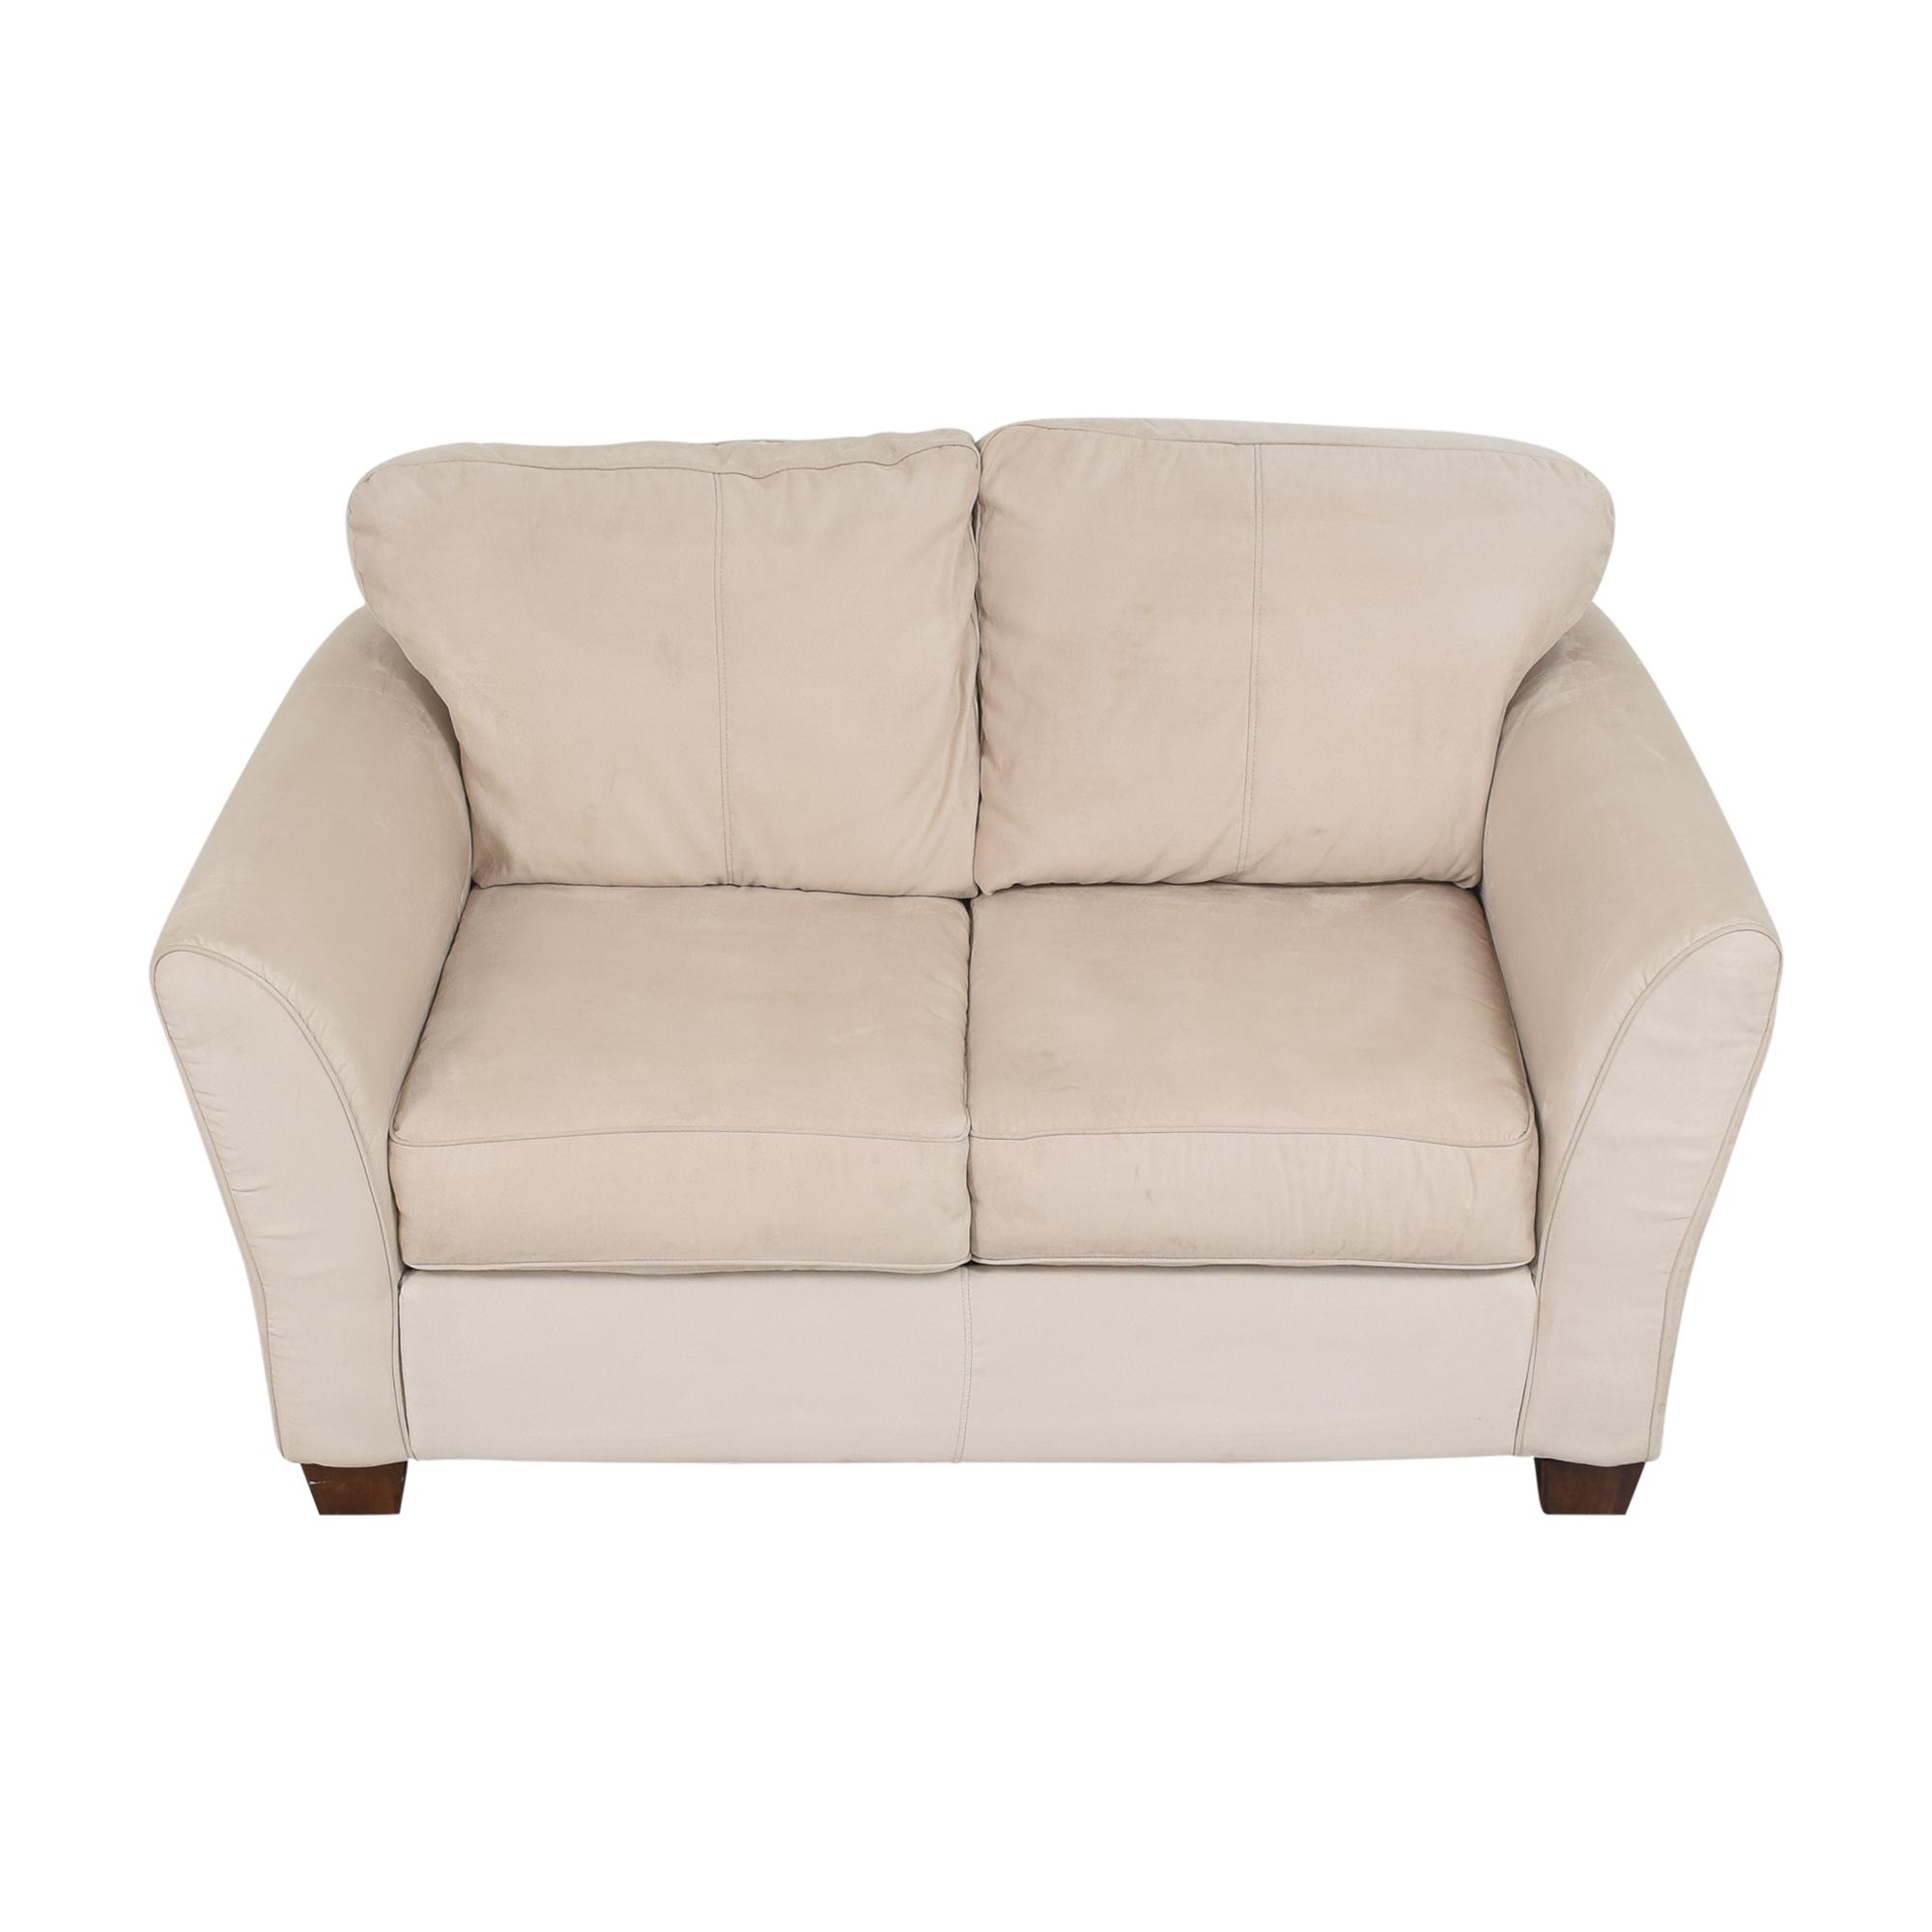 Ashley Furniture Ashley Furniture Modern Loveseat used